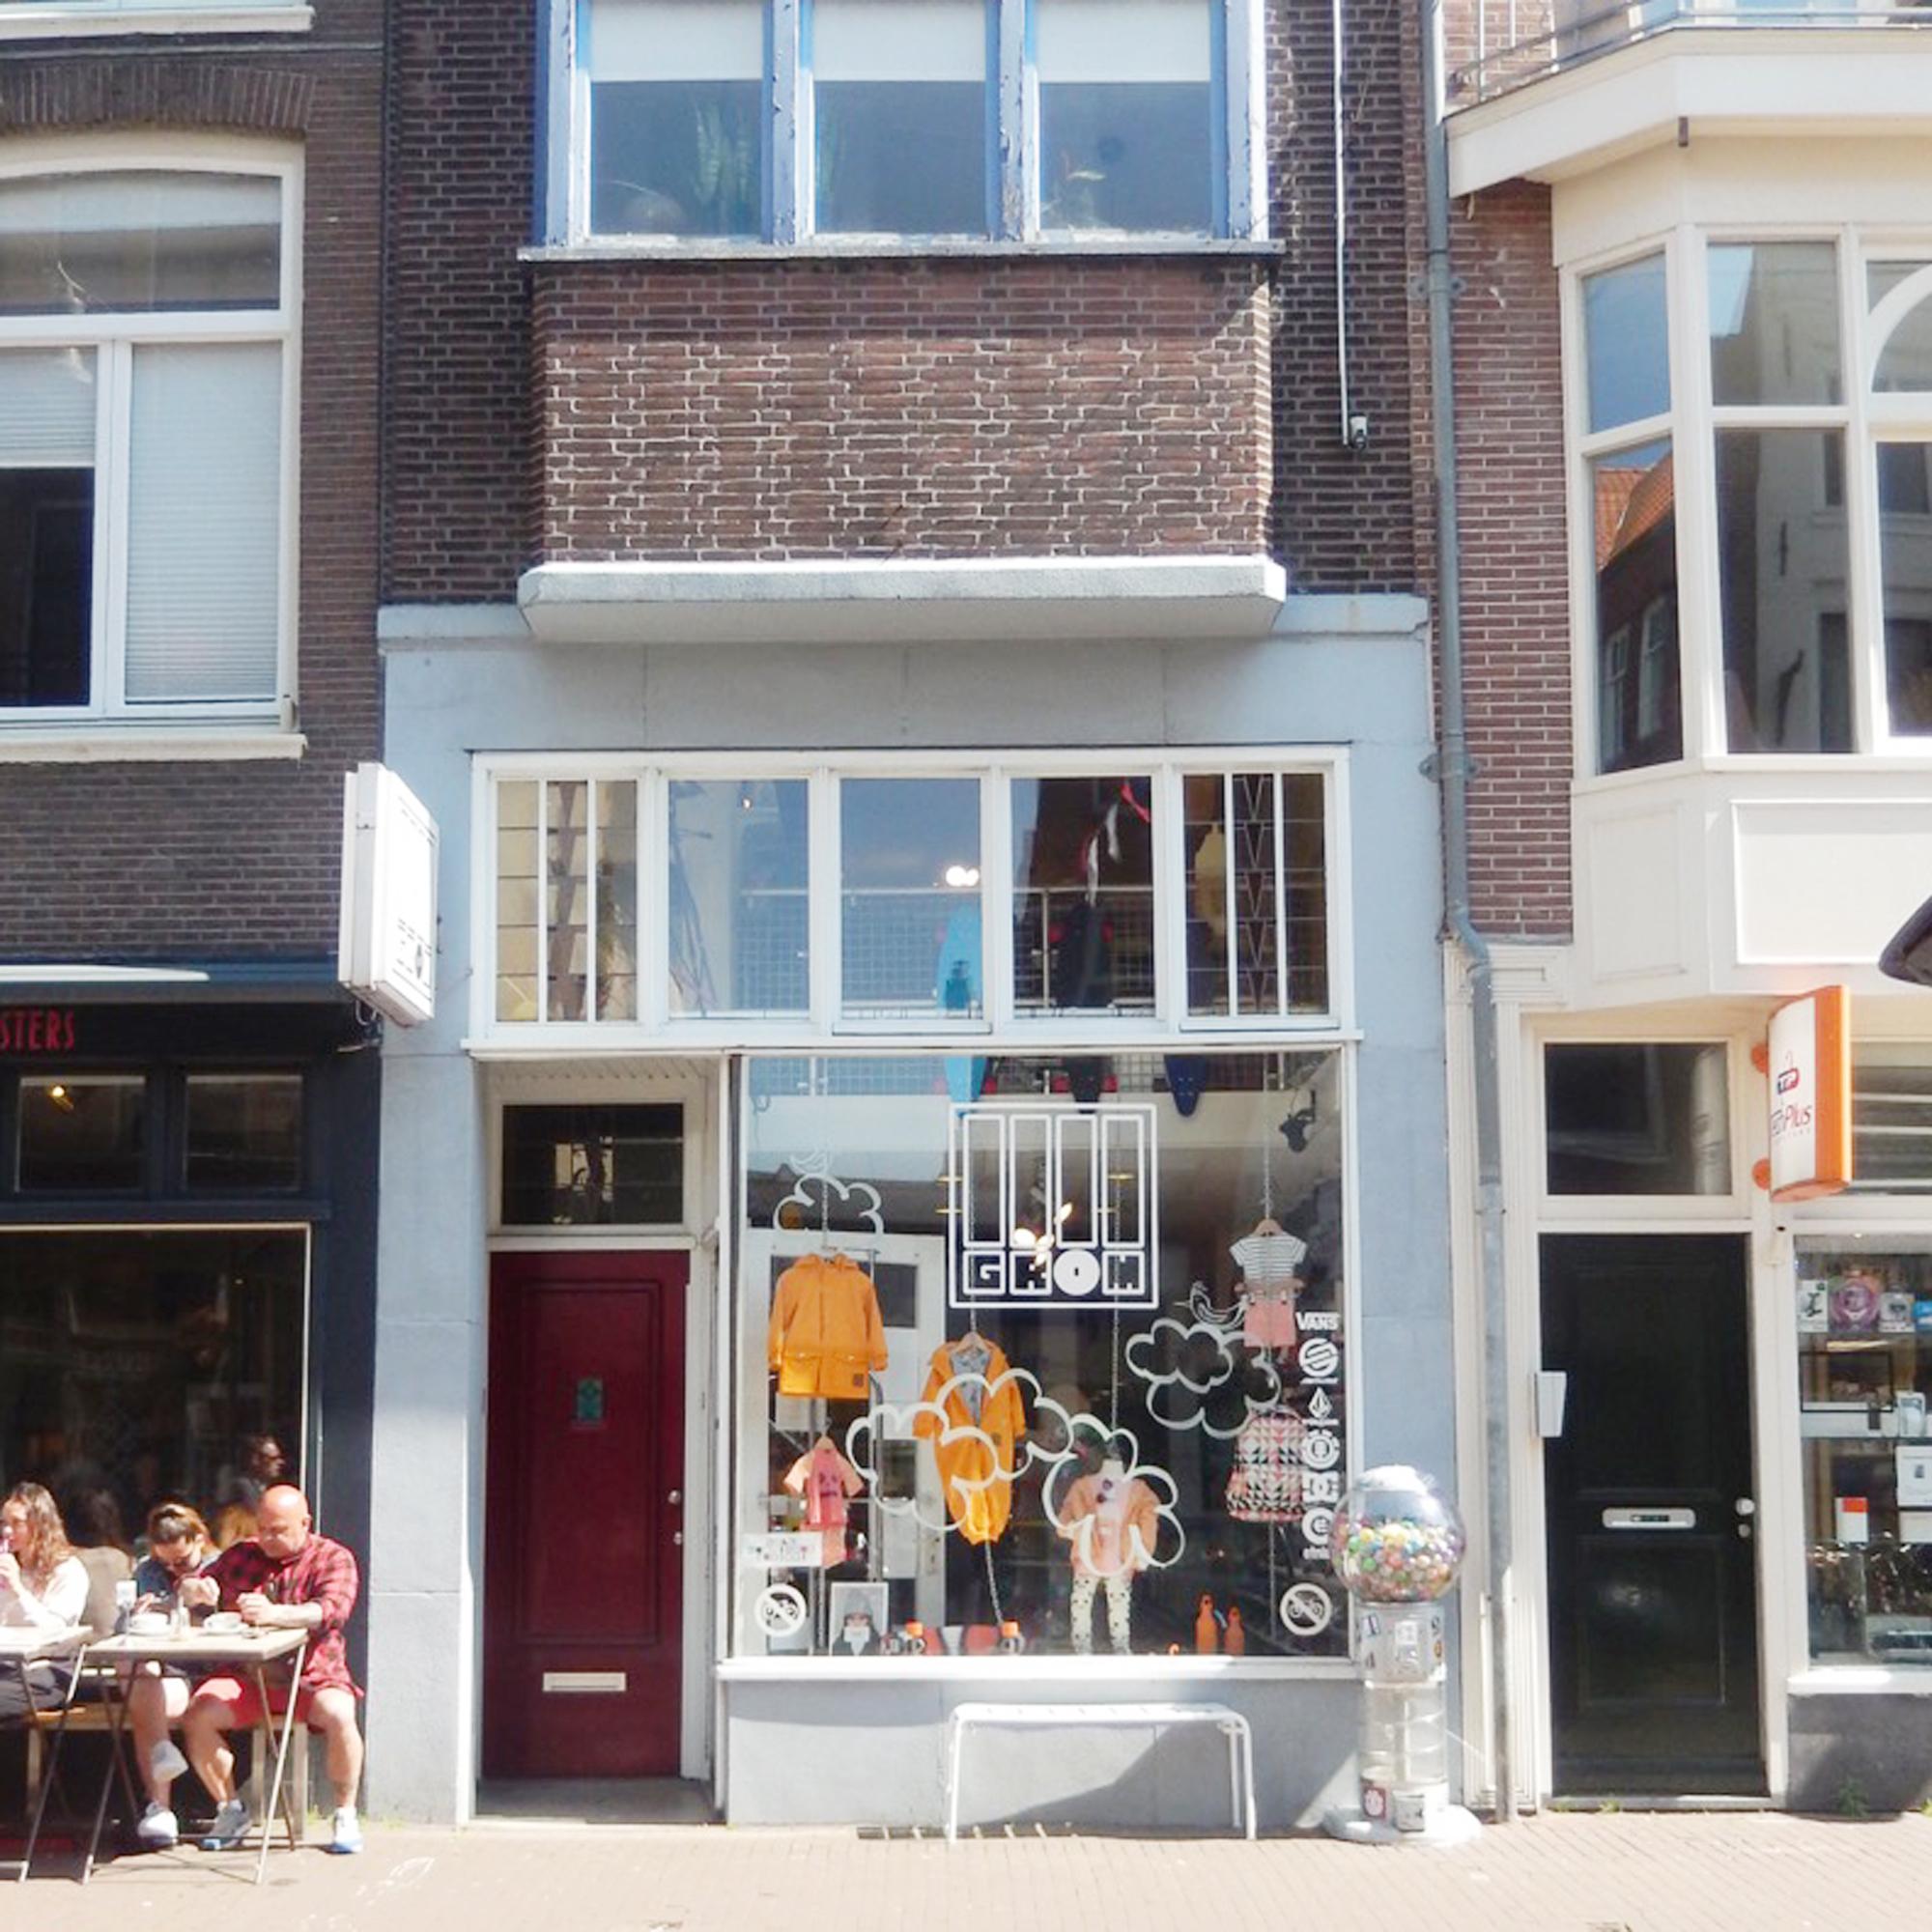 Kindvriendelijke hotspots Amsterdam Grom